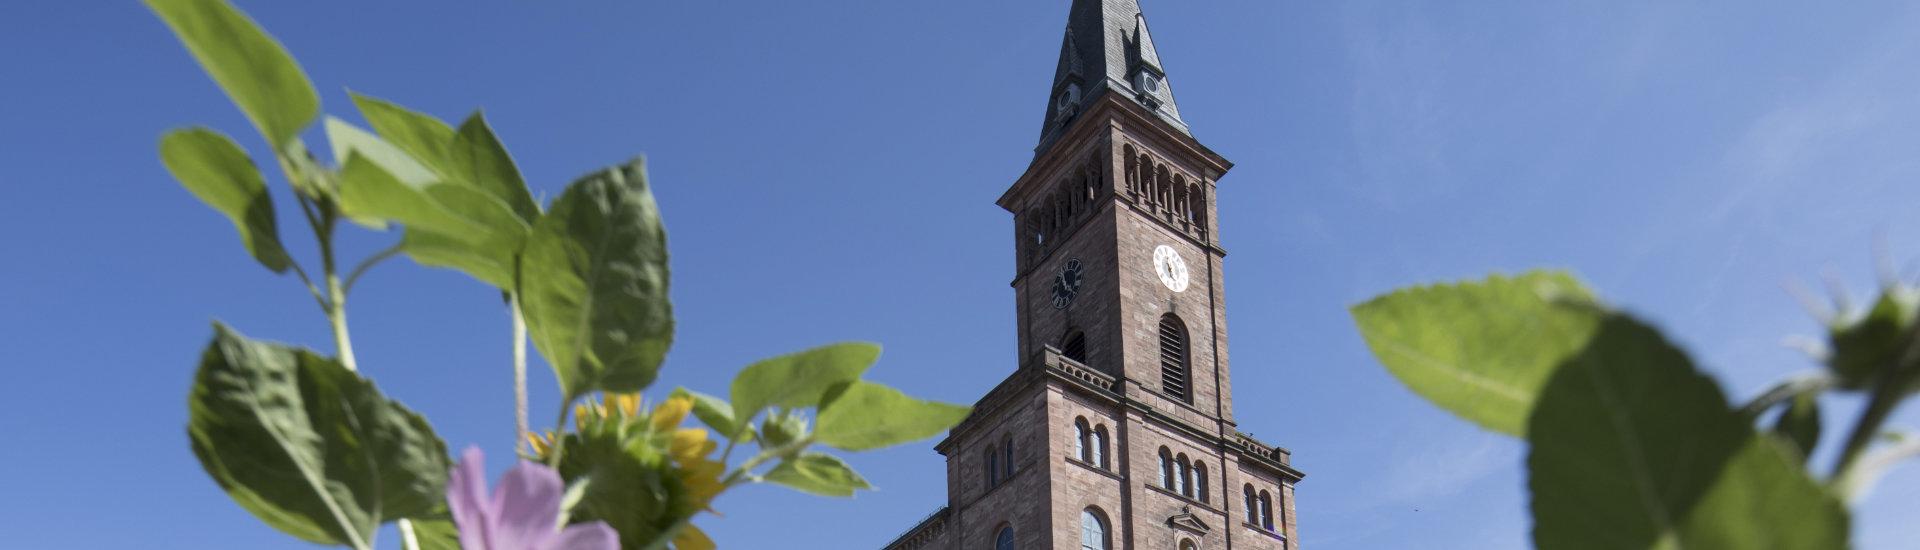 Foto: Kirchturm der Laufer Kirche